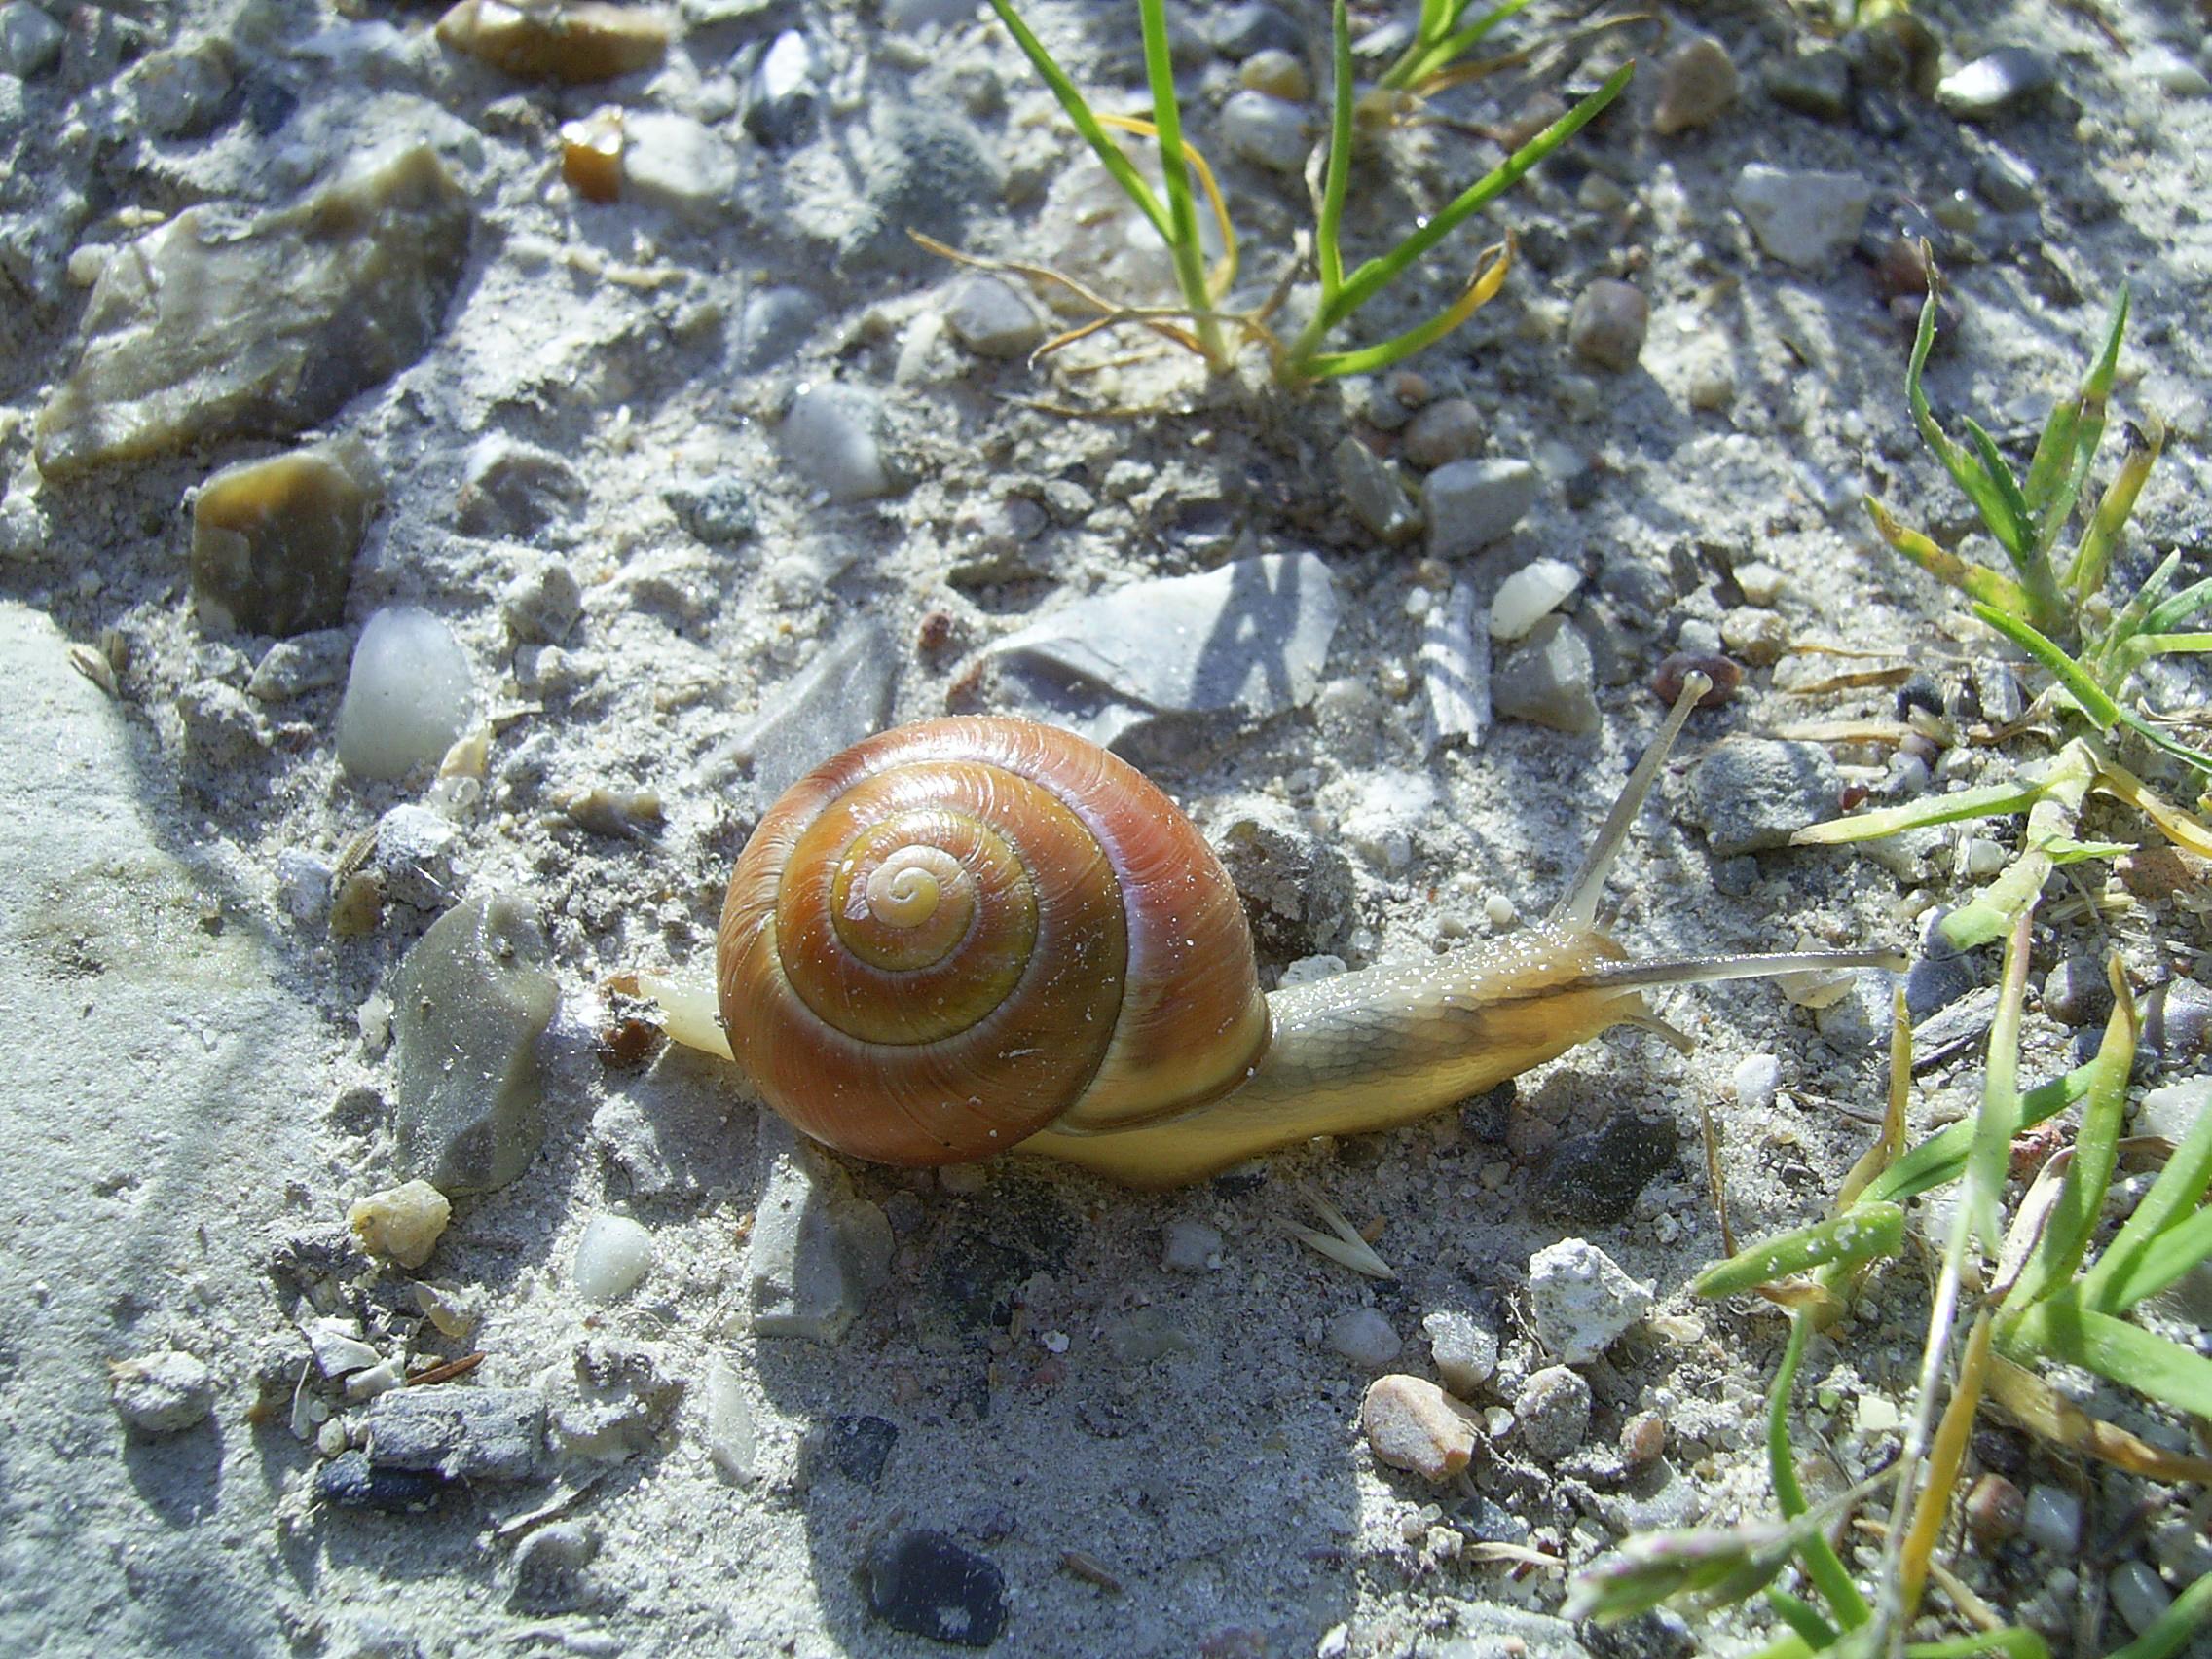 Norwegian snail, Animal, Bspo06, Crawl, Insect, HQ Photo